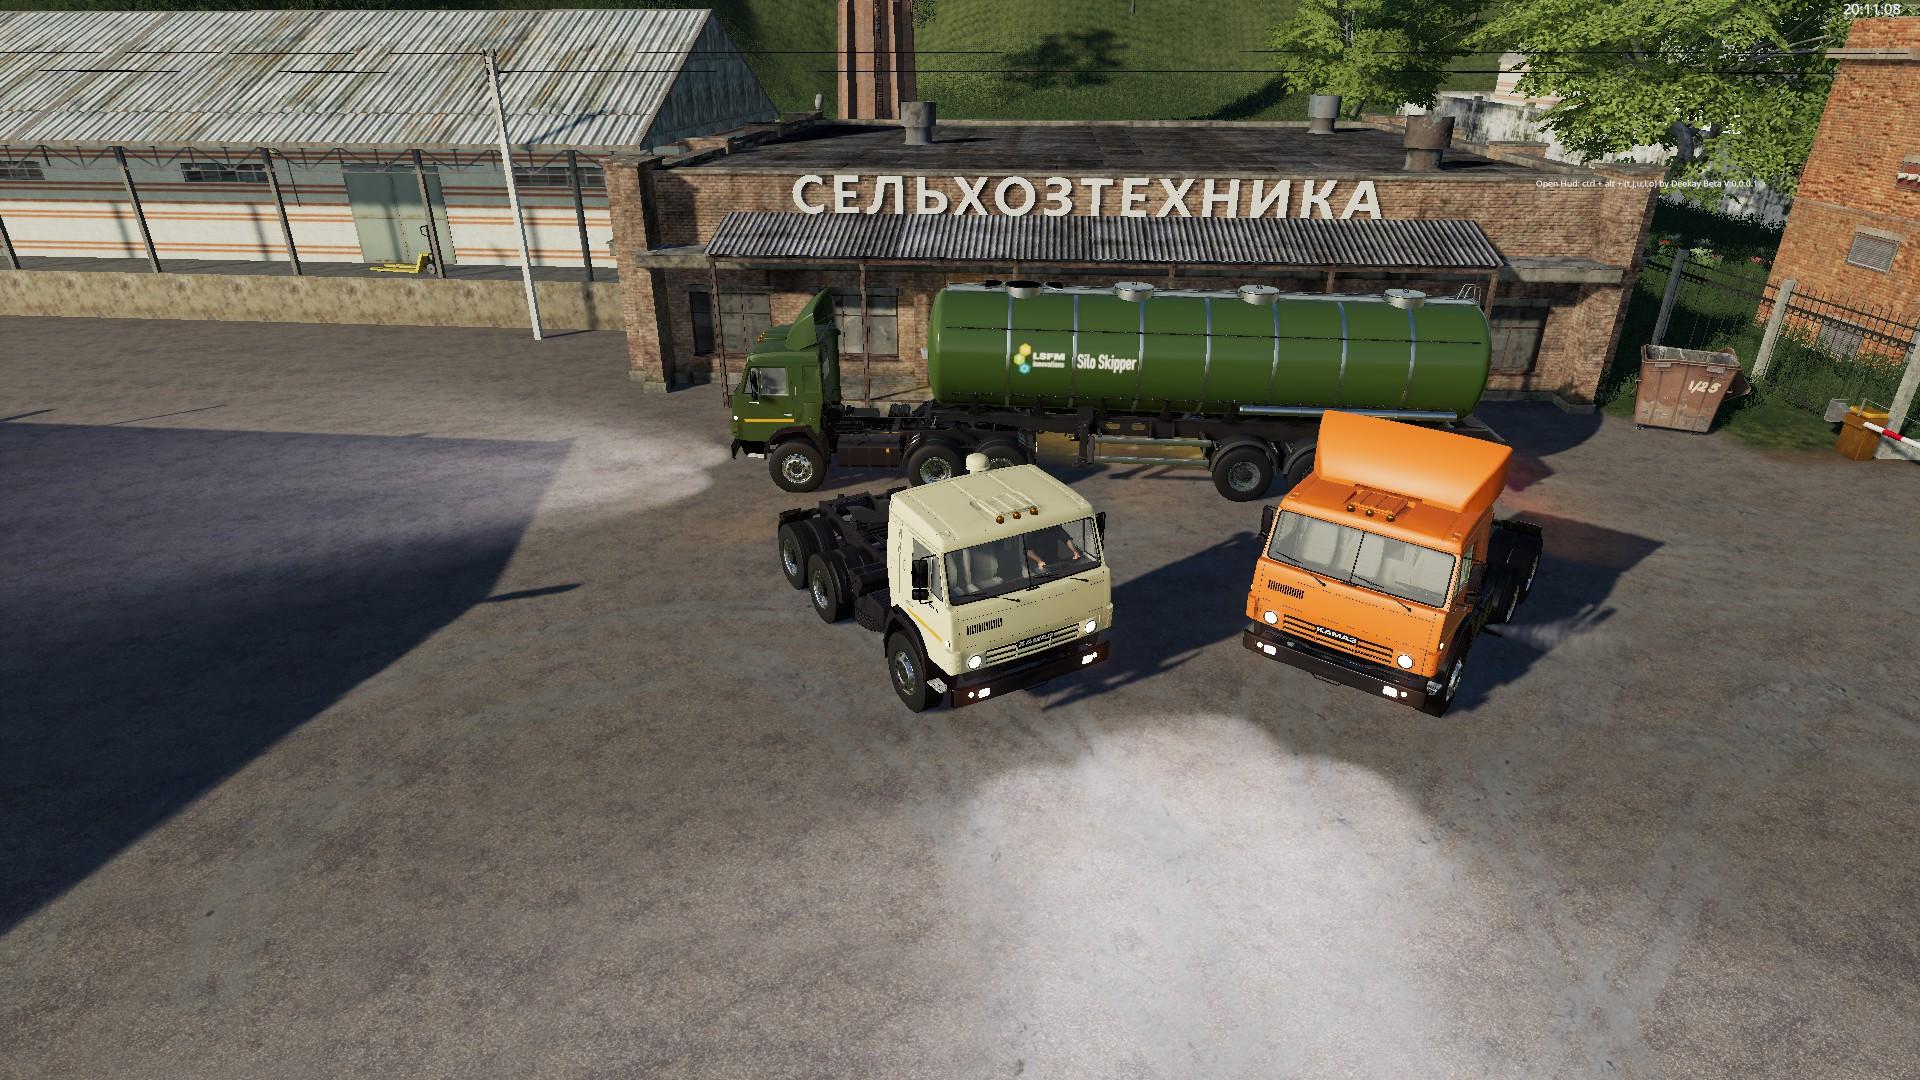 Тягач КамАЗ 5410 V1.0.0.0 для Farming Simulator 2019